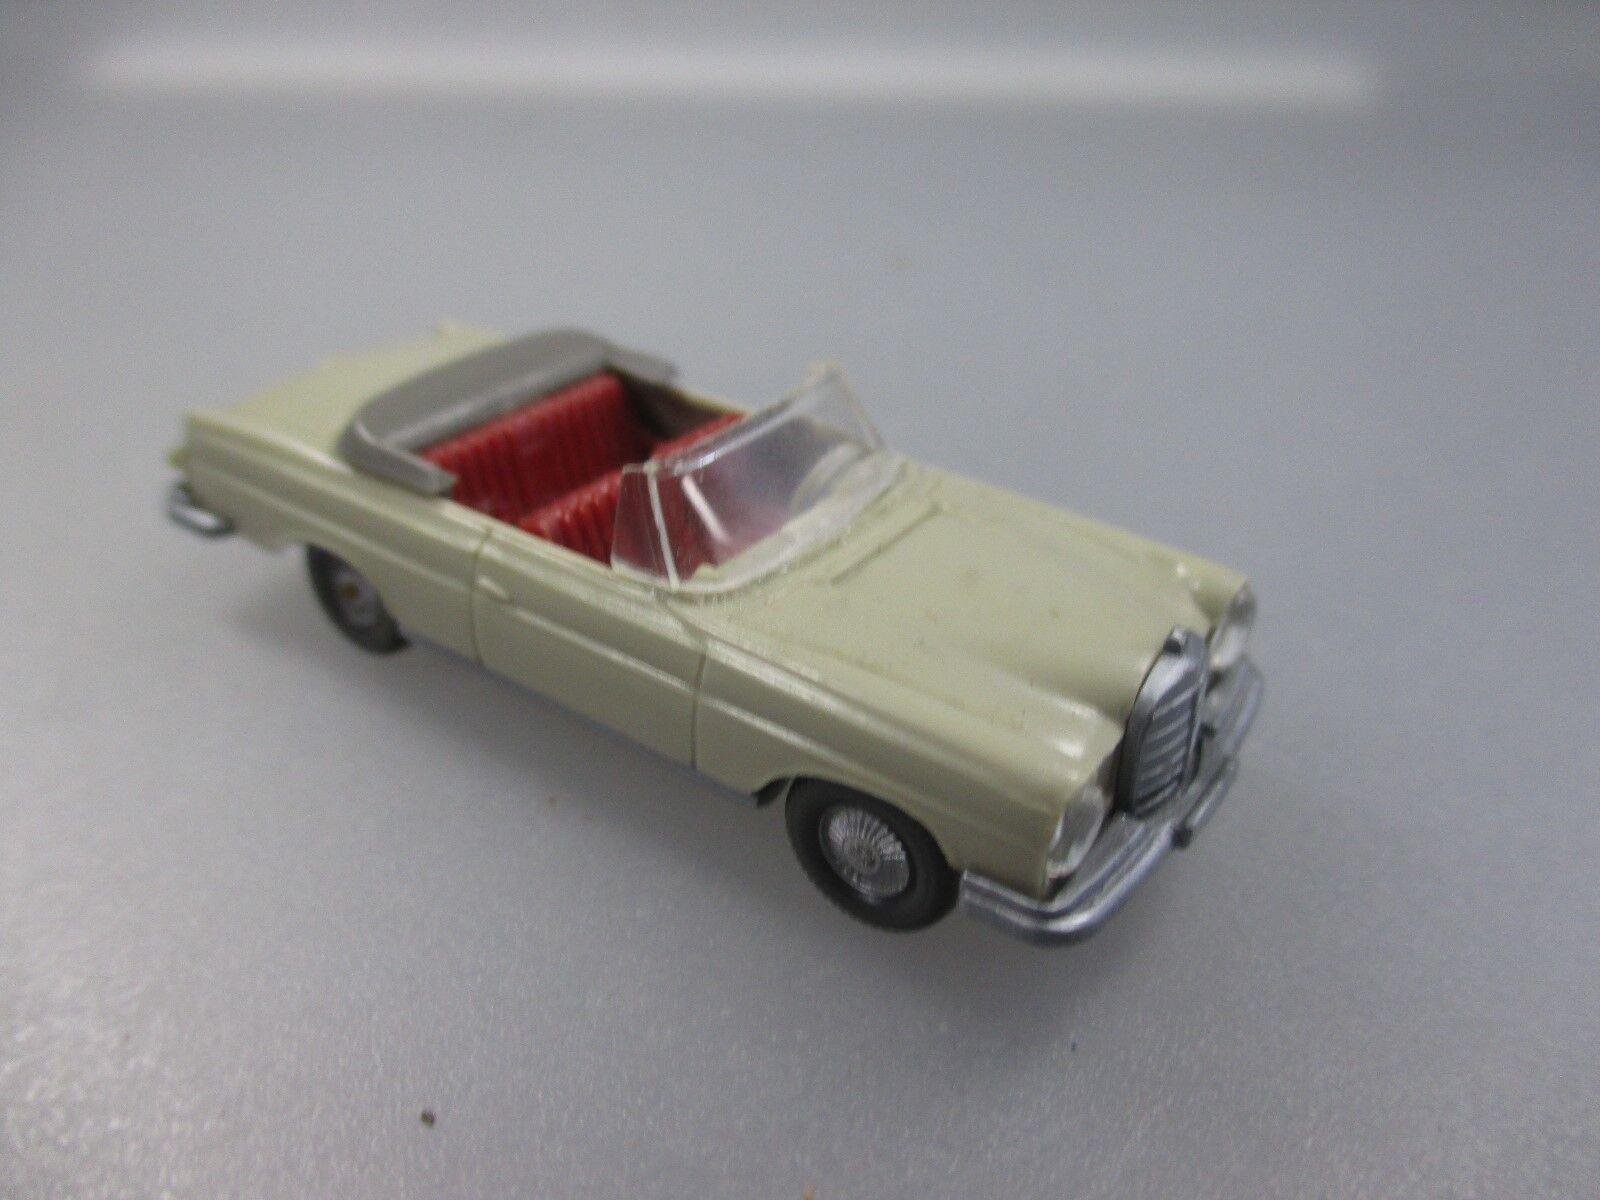 Wiking  MB 300SE Cabriolet, hellgelbgrau, rar, Saure HB 382 3D (Schub91)